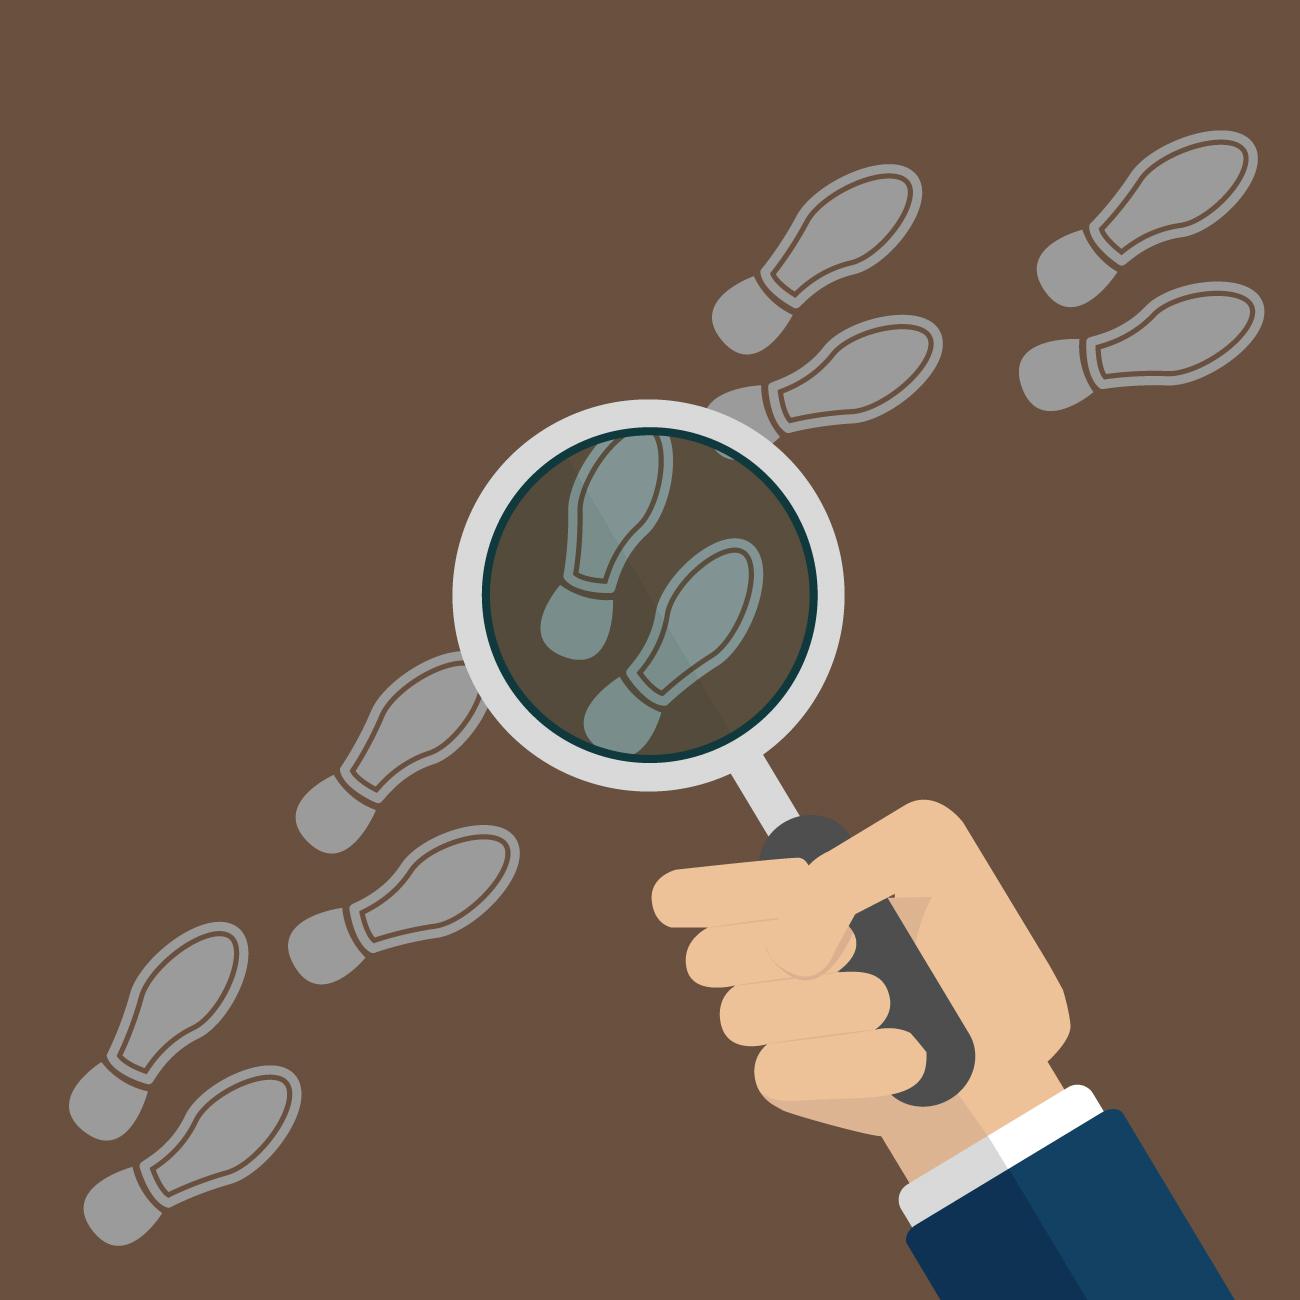 lens-detectives